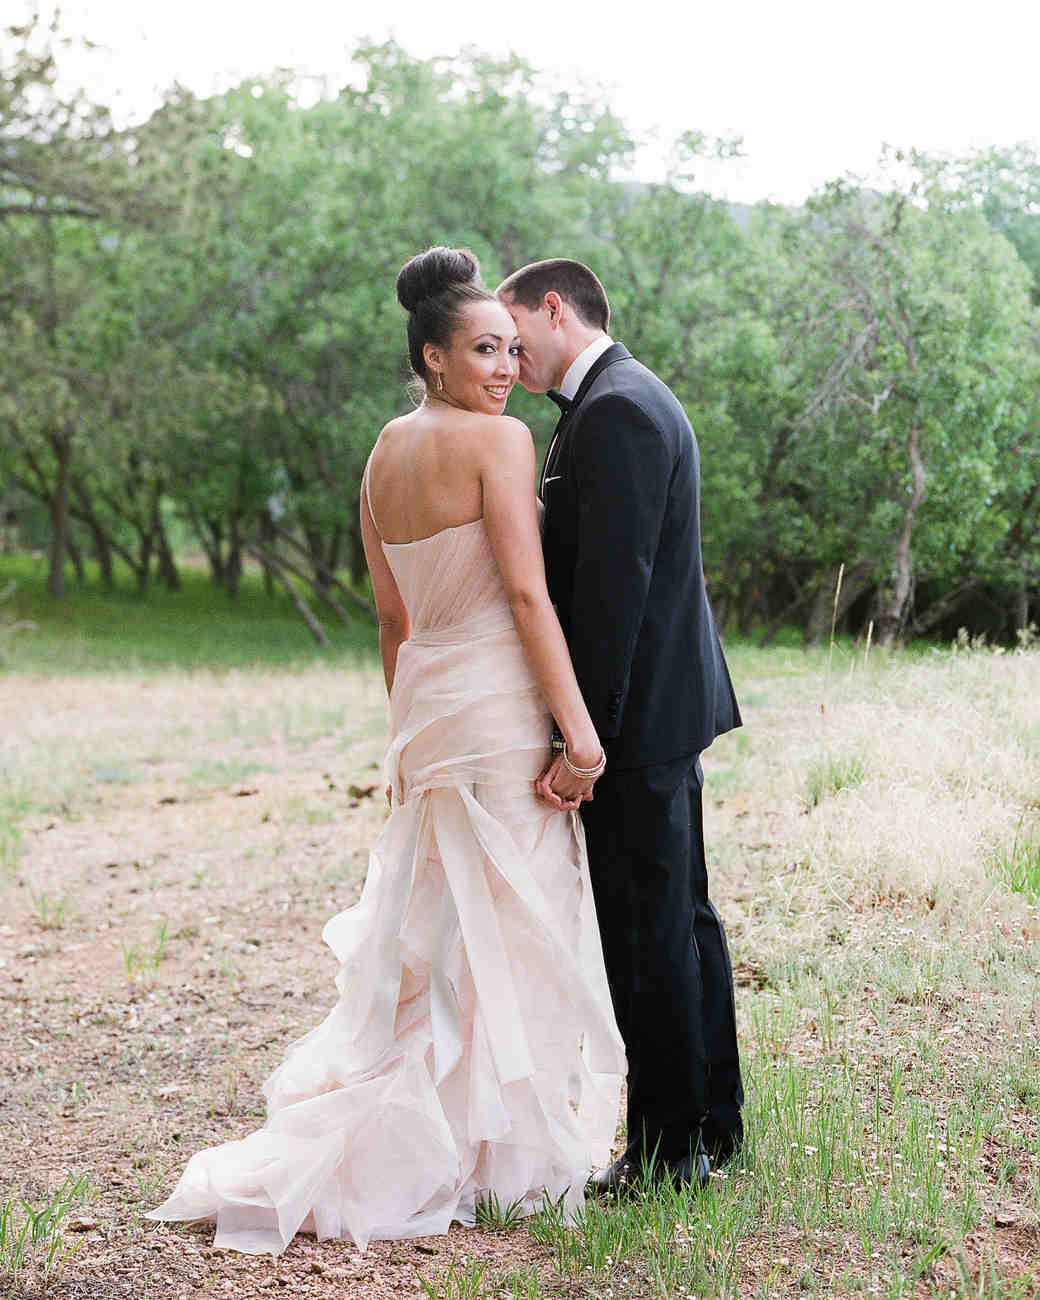 alex-james-wedding-couple-0414.jpg